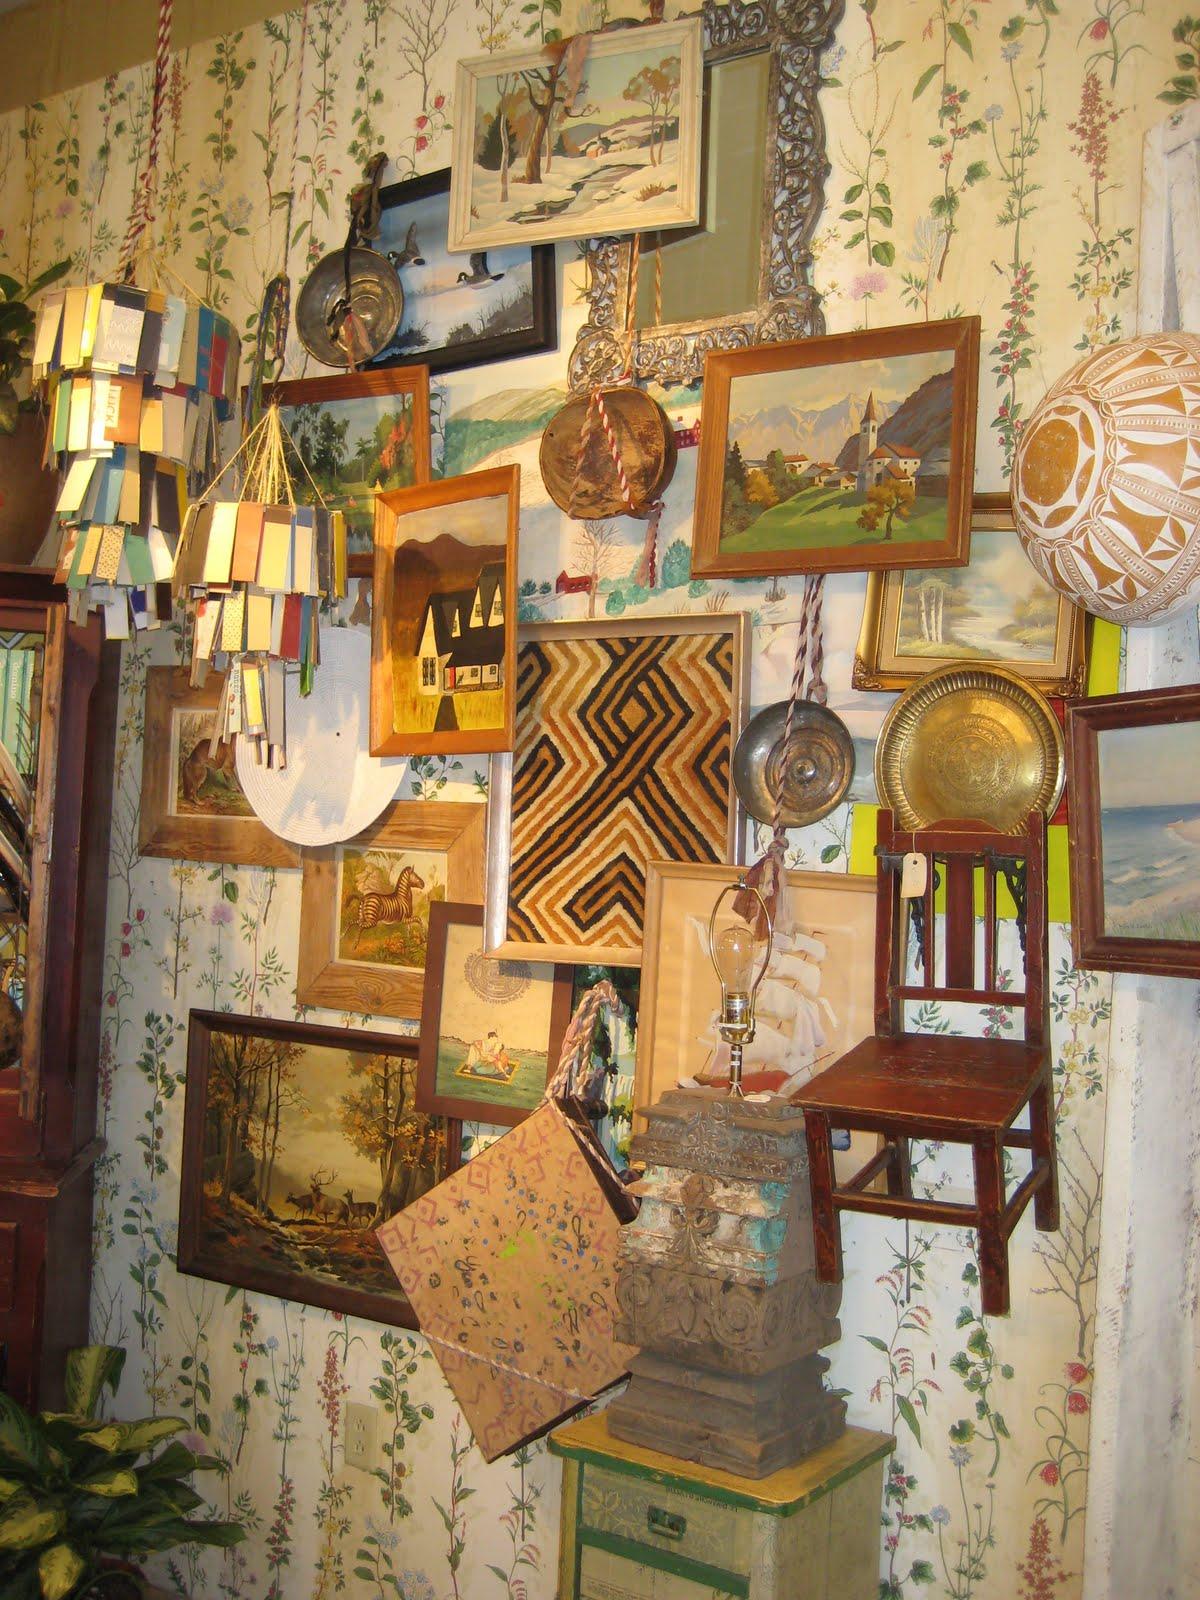 C. Dianne Zweig - Kitsch 'n Stuff: Funky Three Dimensional ...